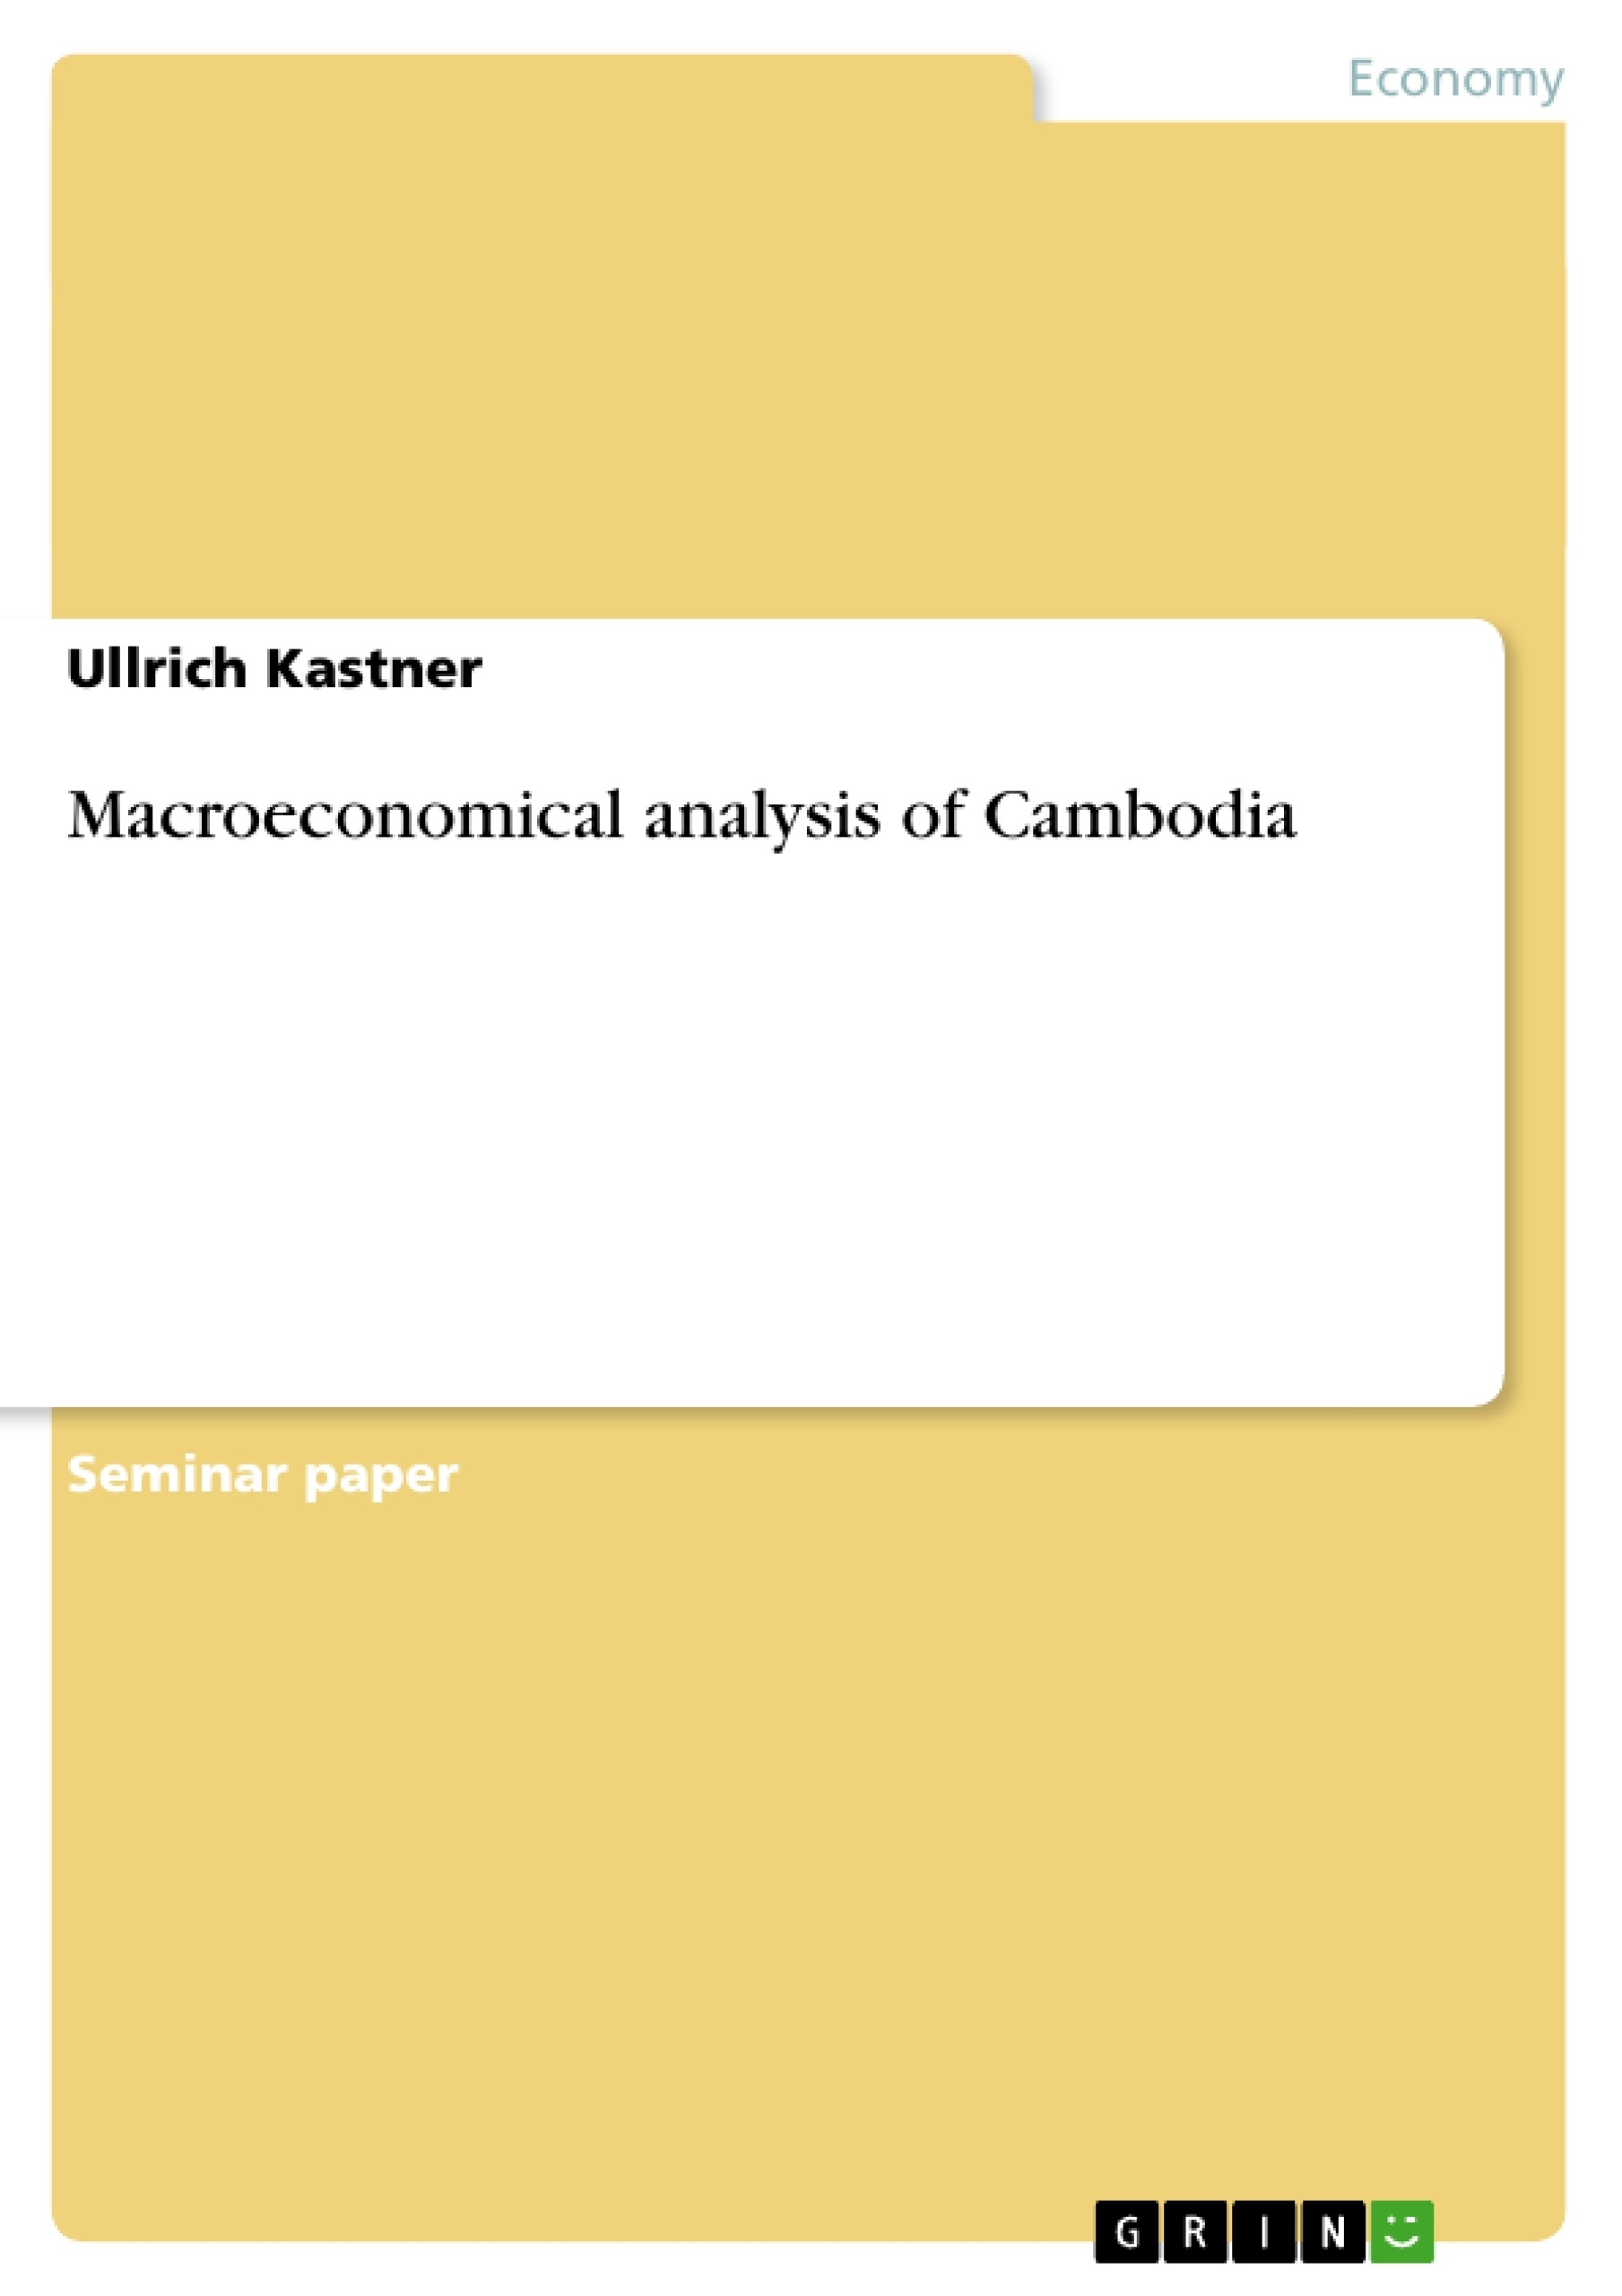 Title: Macroeconomical analysis of Cambodia